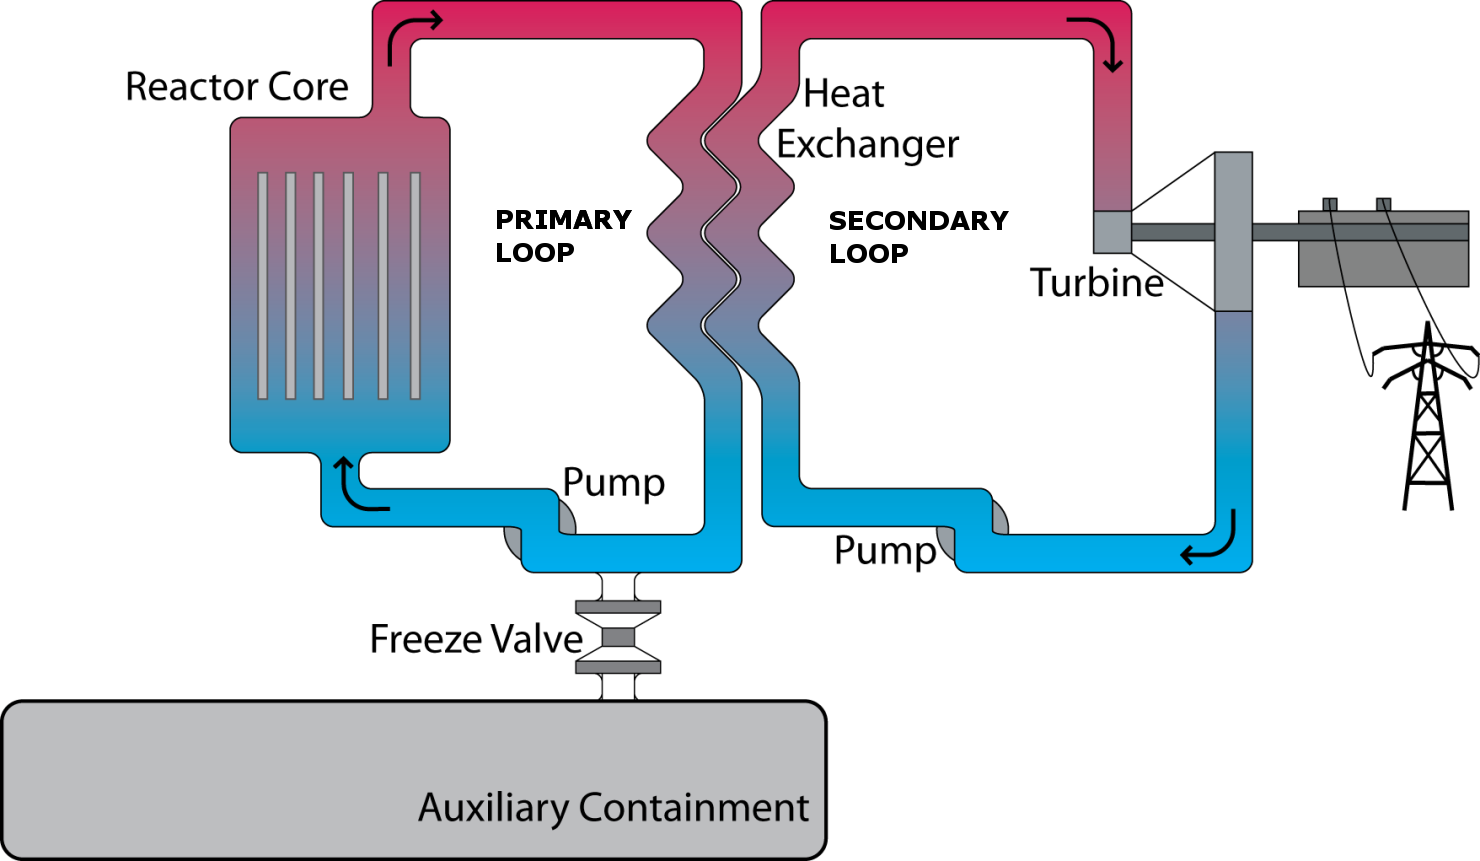 Thorium Engine Diagram Wiring Library 99 Dodge Ram Fuse Box S 1500f Schmatic Of Transatomic Powers Waste Annihilating Molten Salt Reactor Wamsr